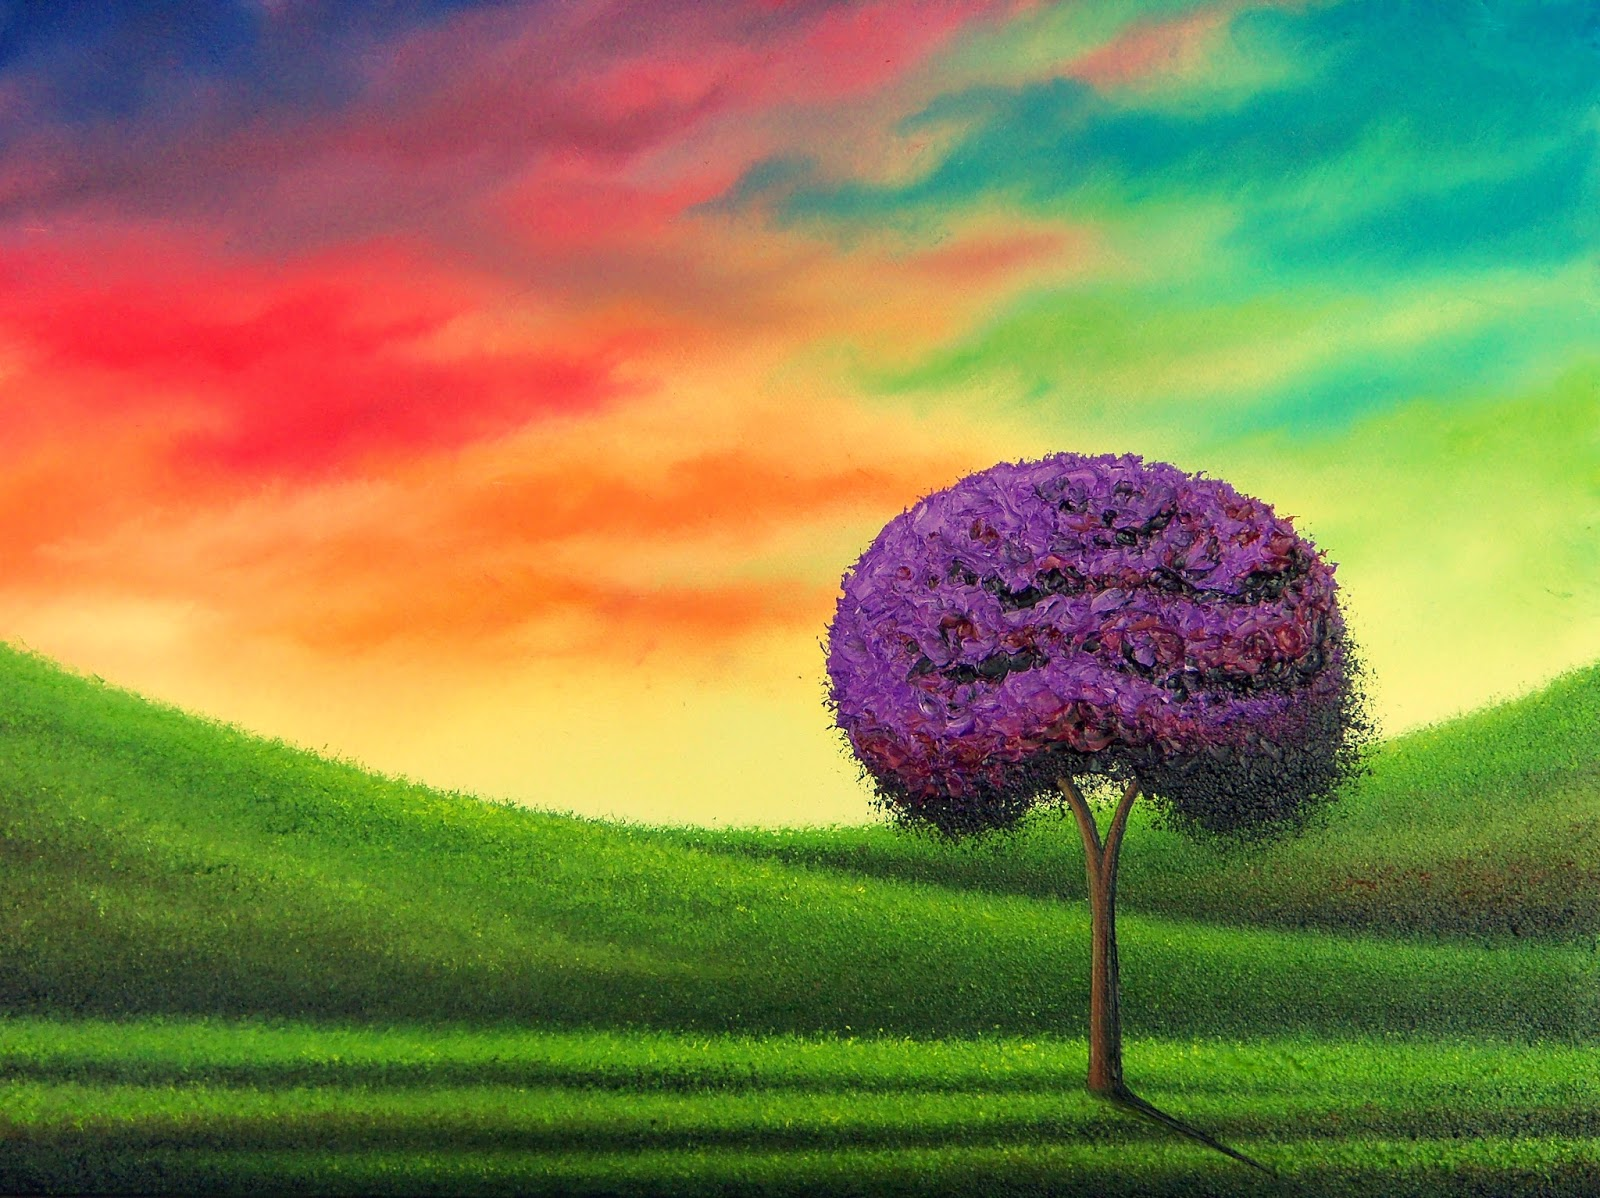 Purple Tree Art Sunset Landscape Painting Contemporary 12 X 16 Original Oil